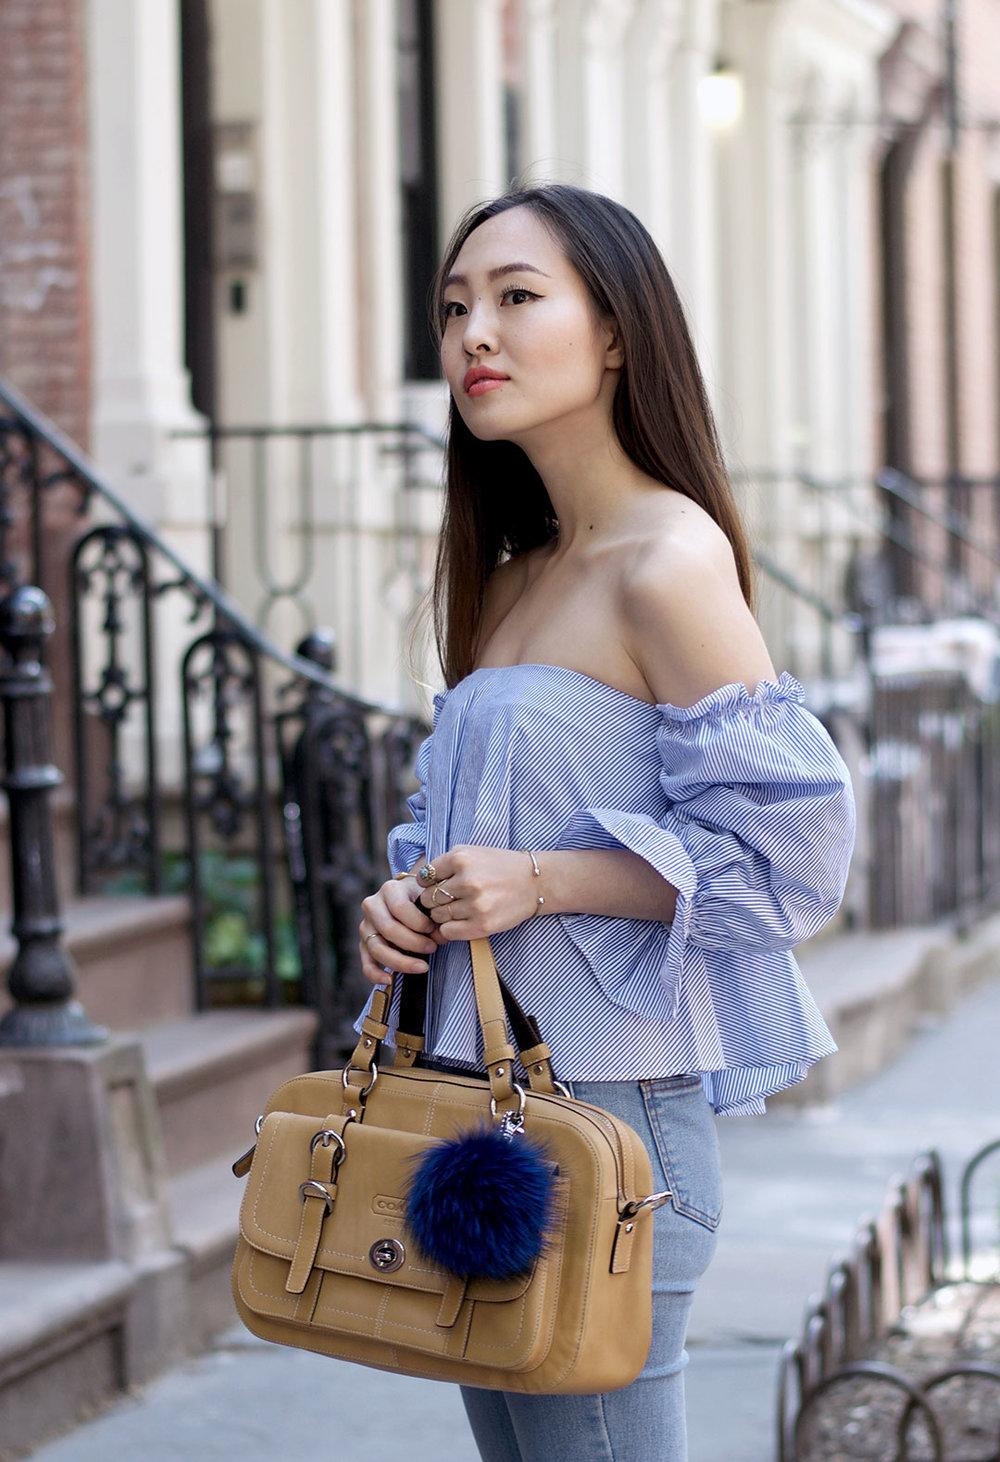 Zara top, Stylenanda jeans, Coach bag